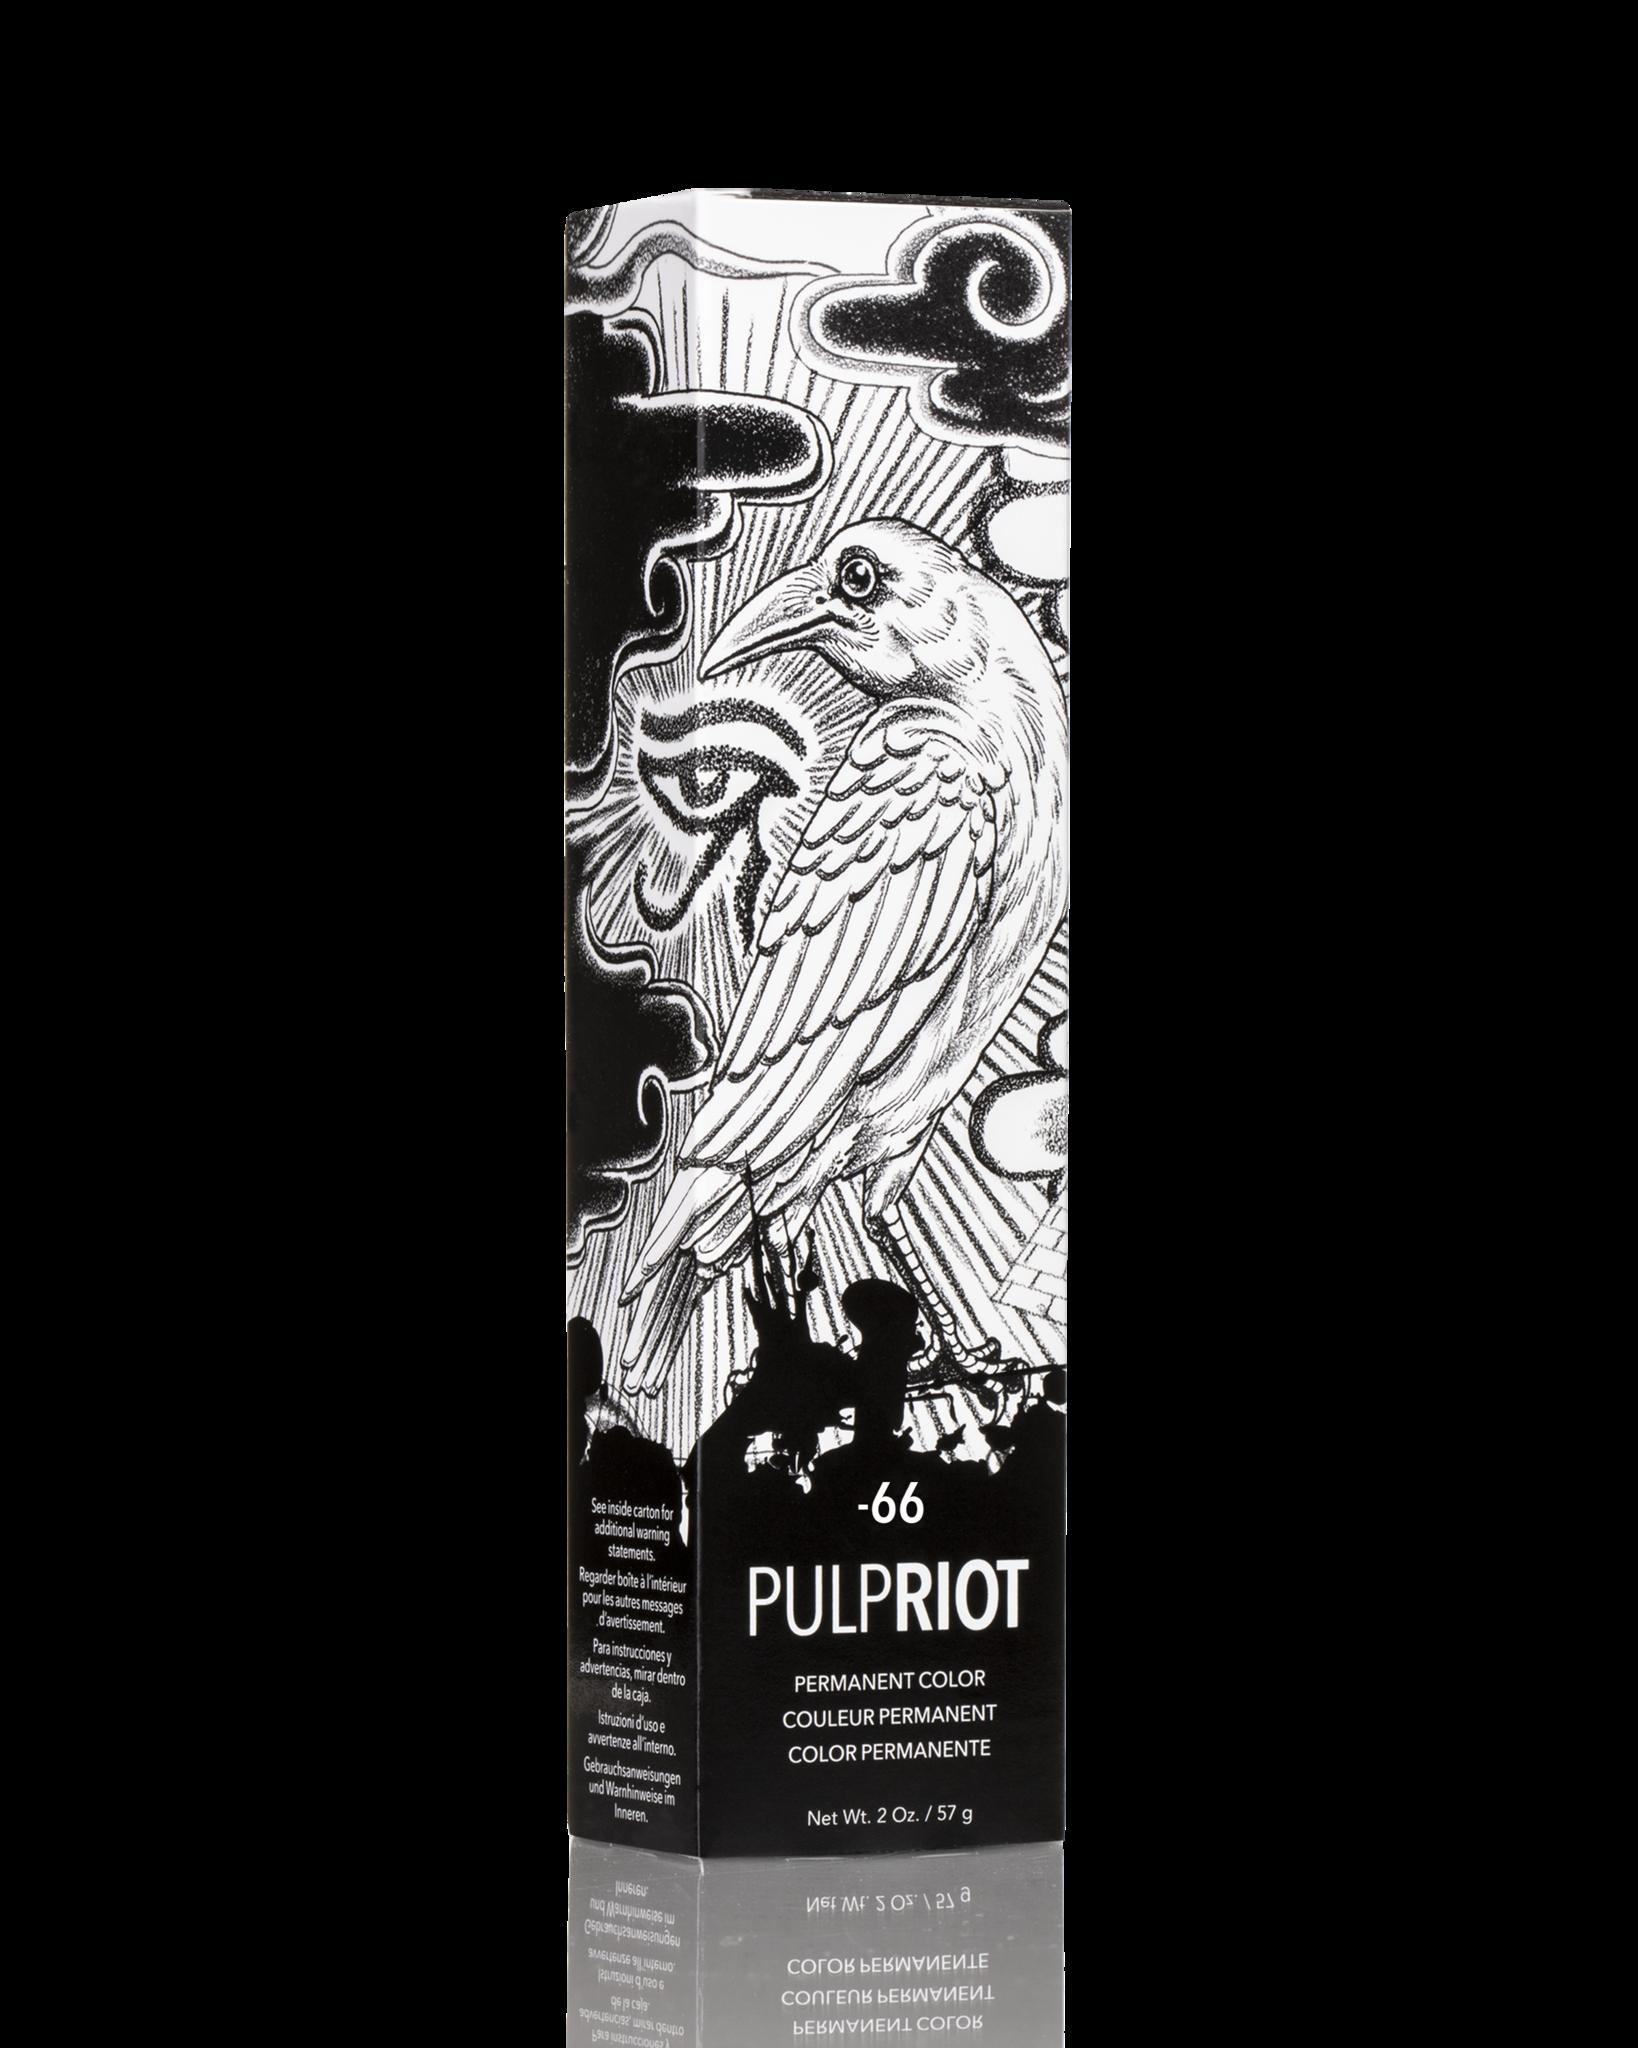 Pulp Riot PULP RIOT FACTION 8 BOOSTER -66